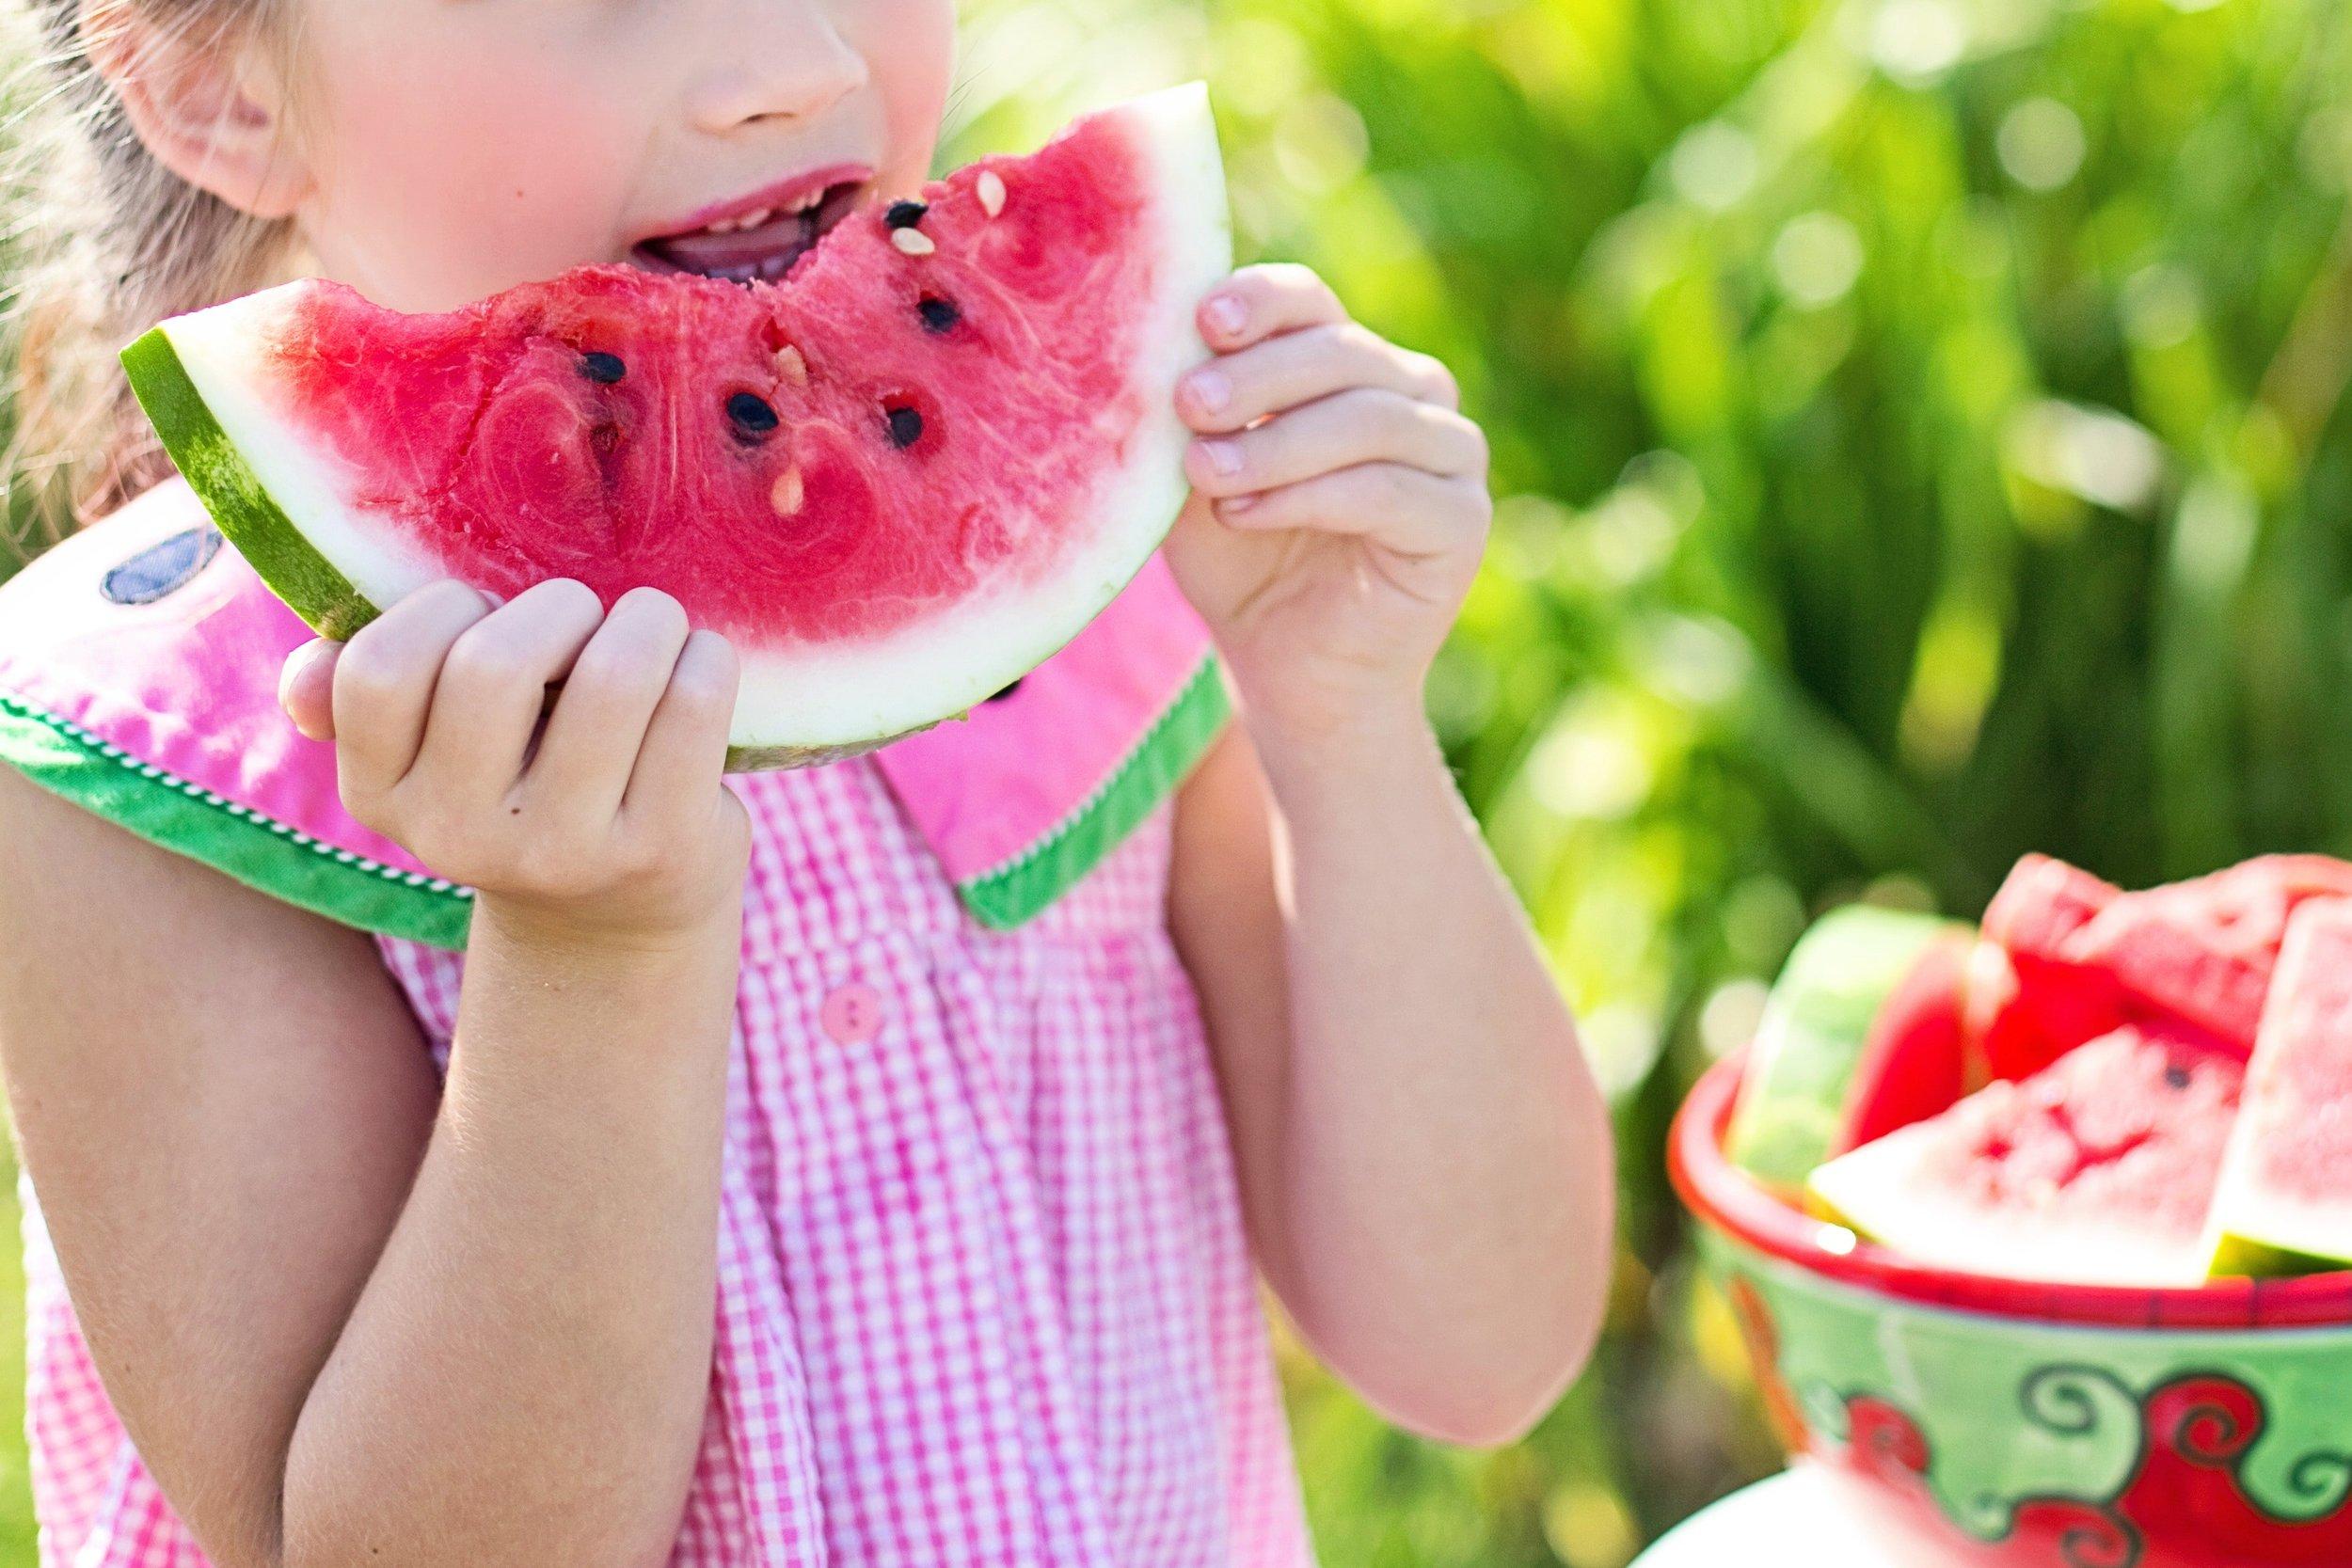 child-eating-food-35545.jpg